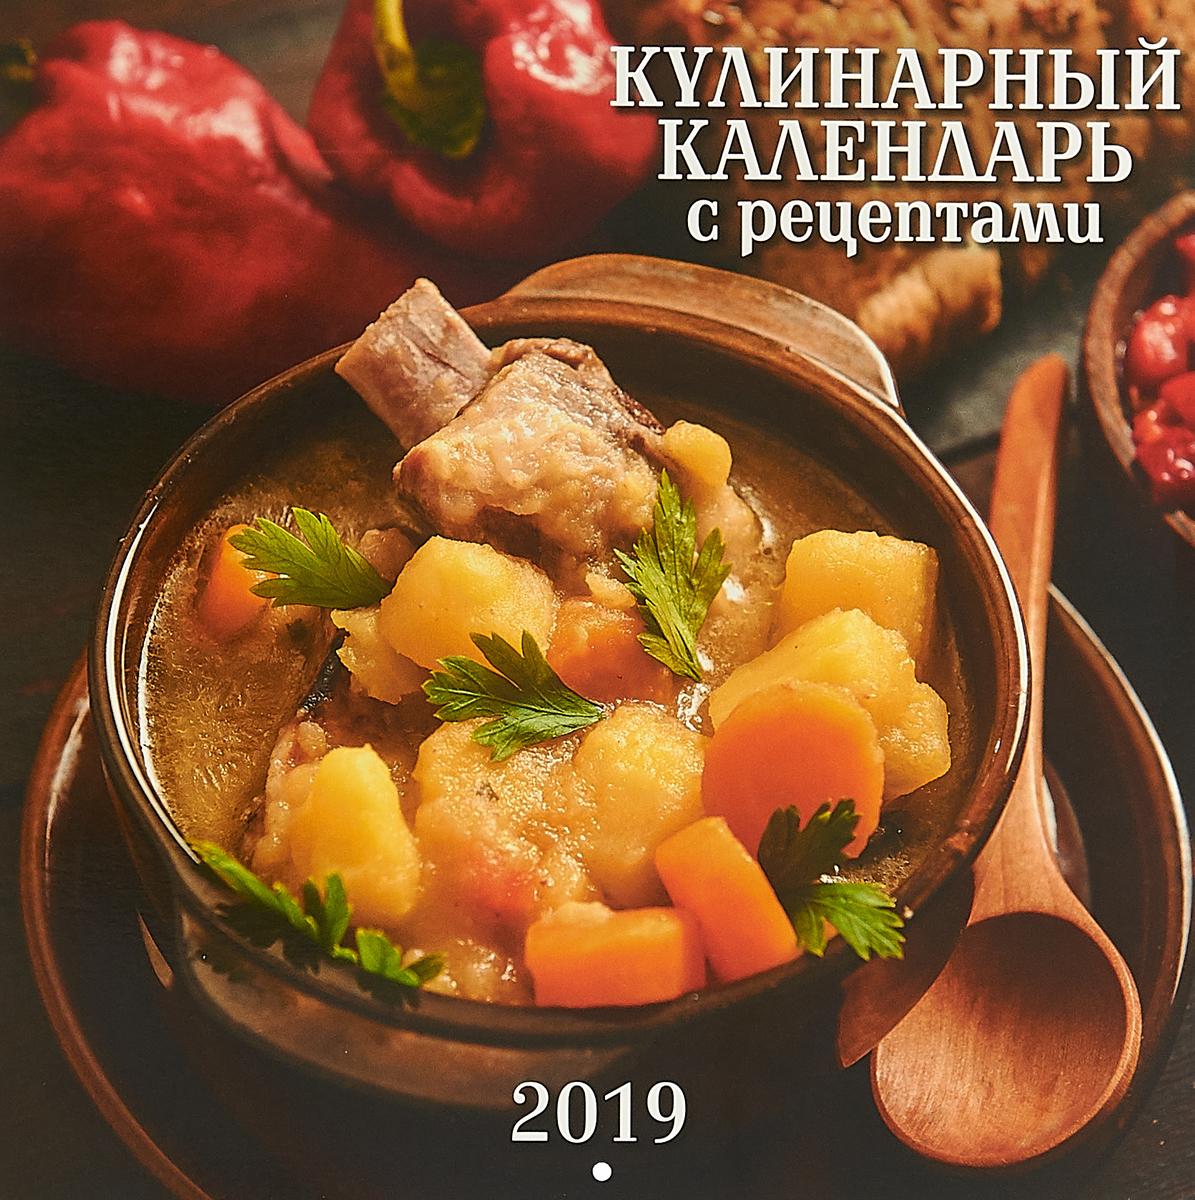 Календарь 2019 (на скрепке). Кулинарный календарь с рецептами